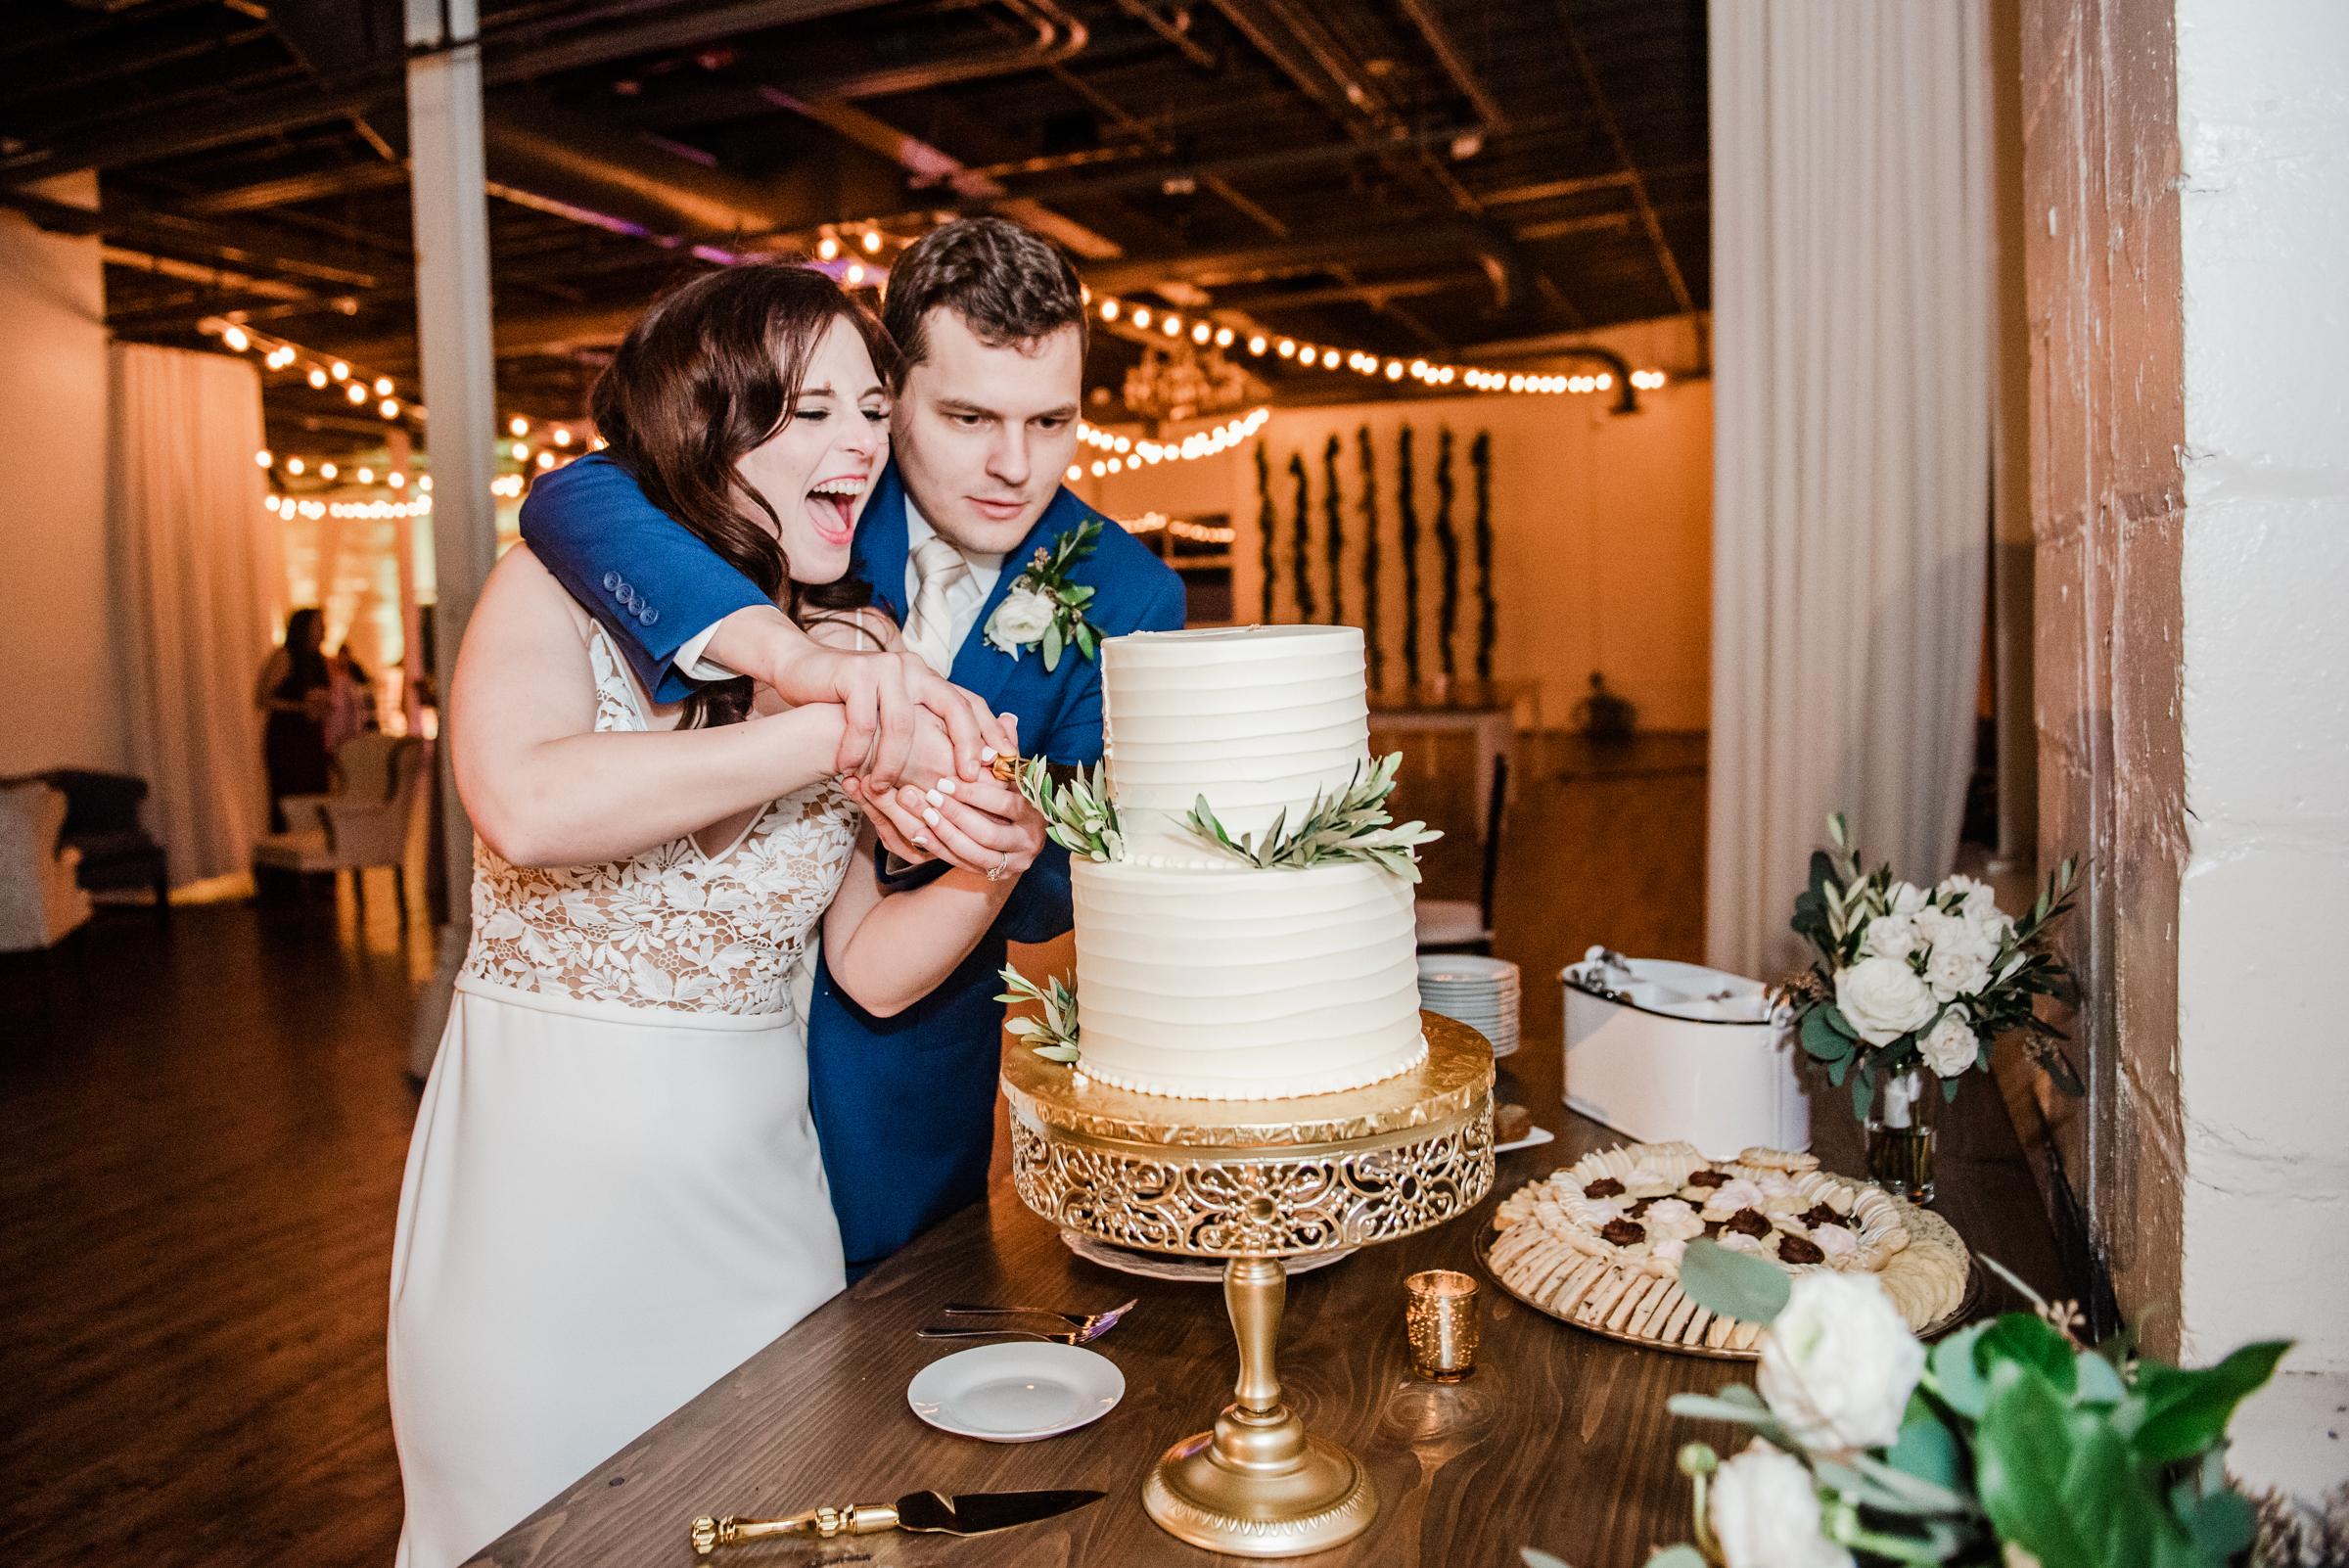 The_Arbor_LoftRochester_Wedding_JILL_STUDIO_Rochester_NY_Photographer_202158.jpg